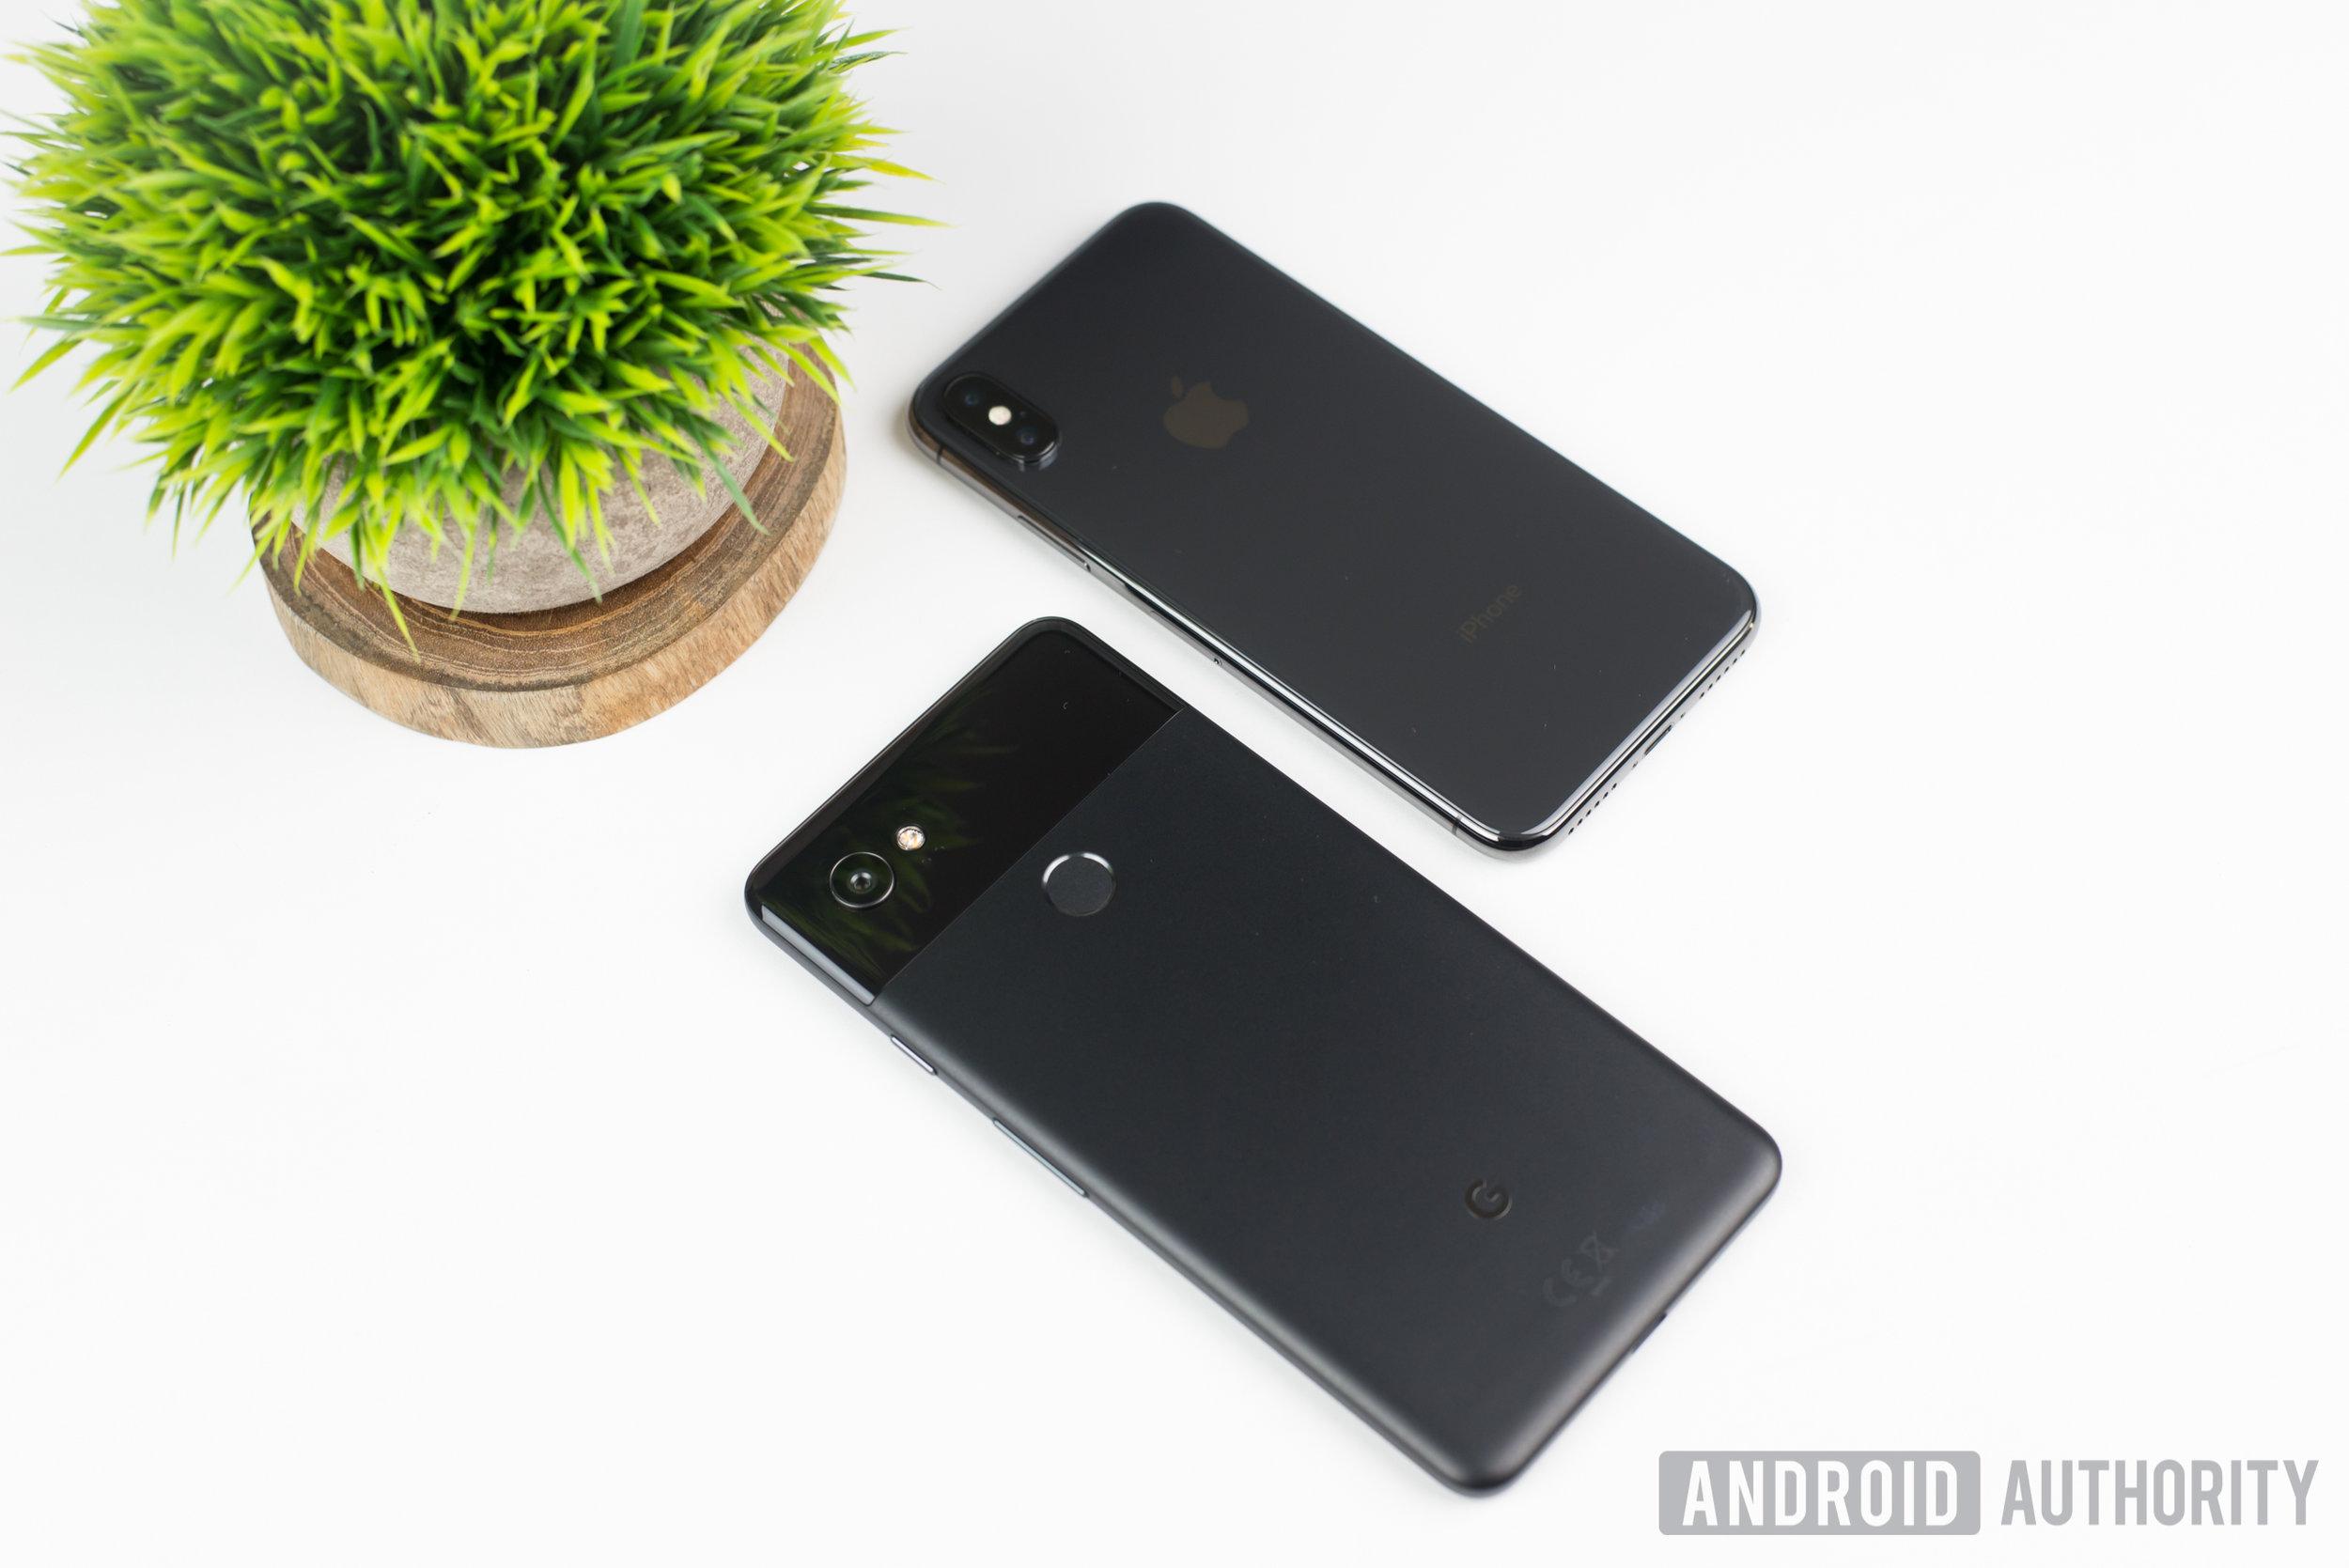 iPhone-X-vs-Google-Pixel-2-XL-1.JPG